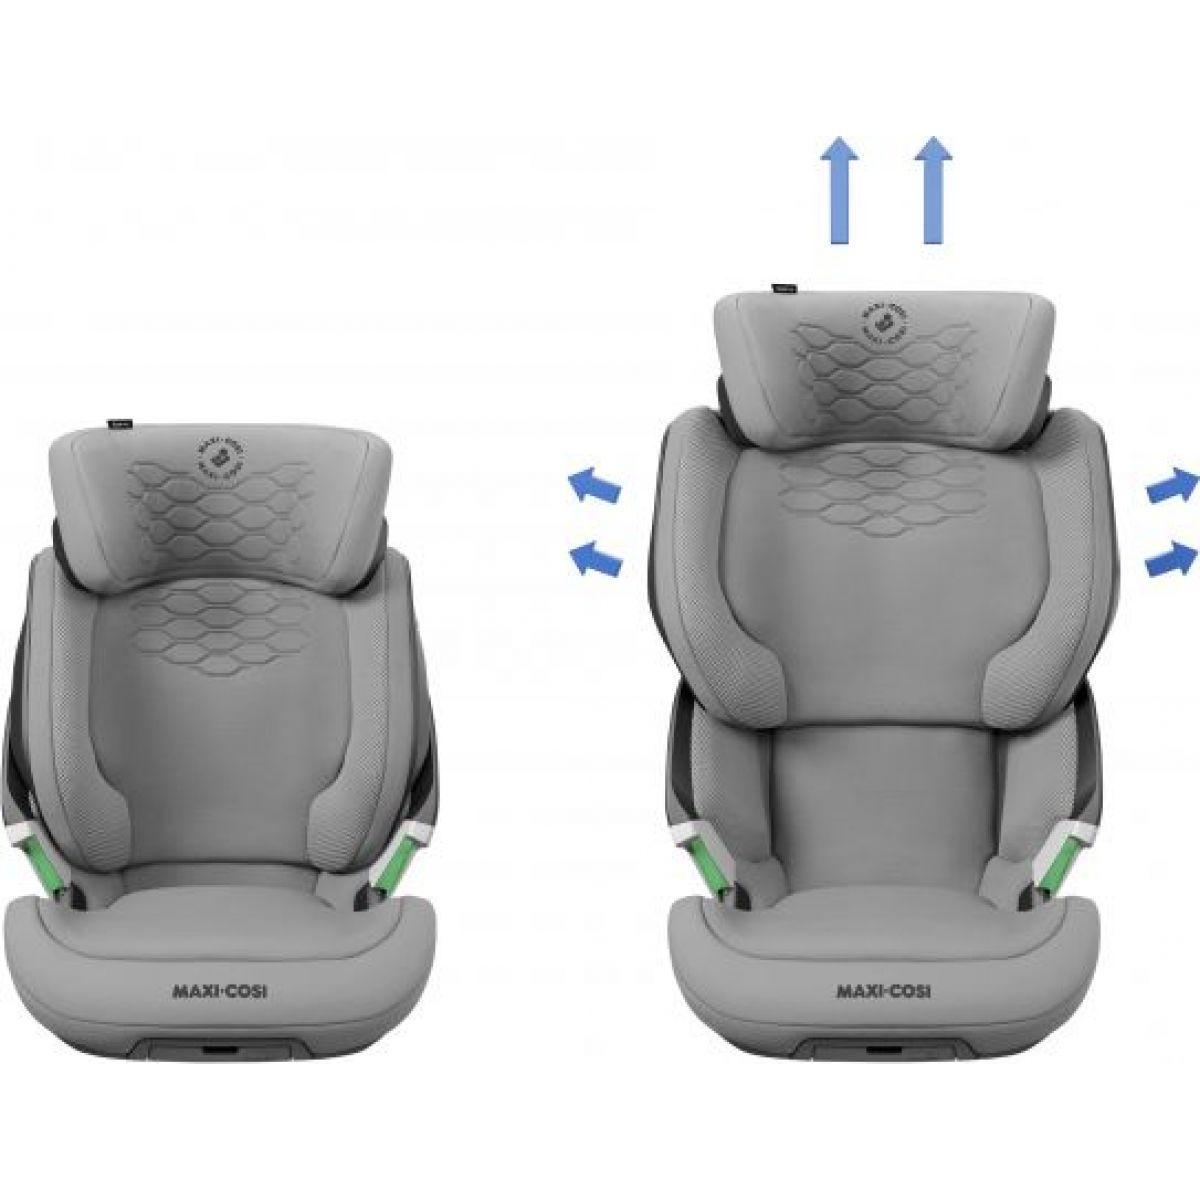 Maxi Cosi Kore Pro i-Size autosedačka Authentic Grey